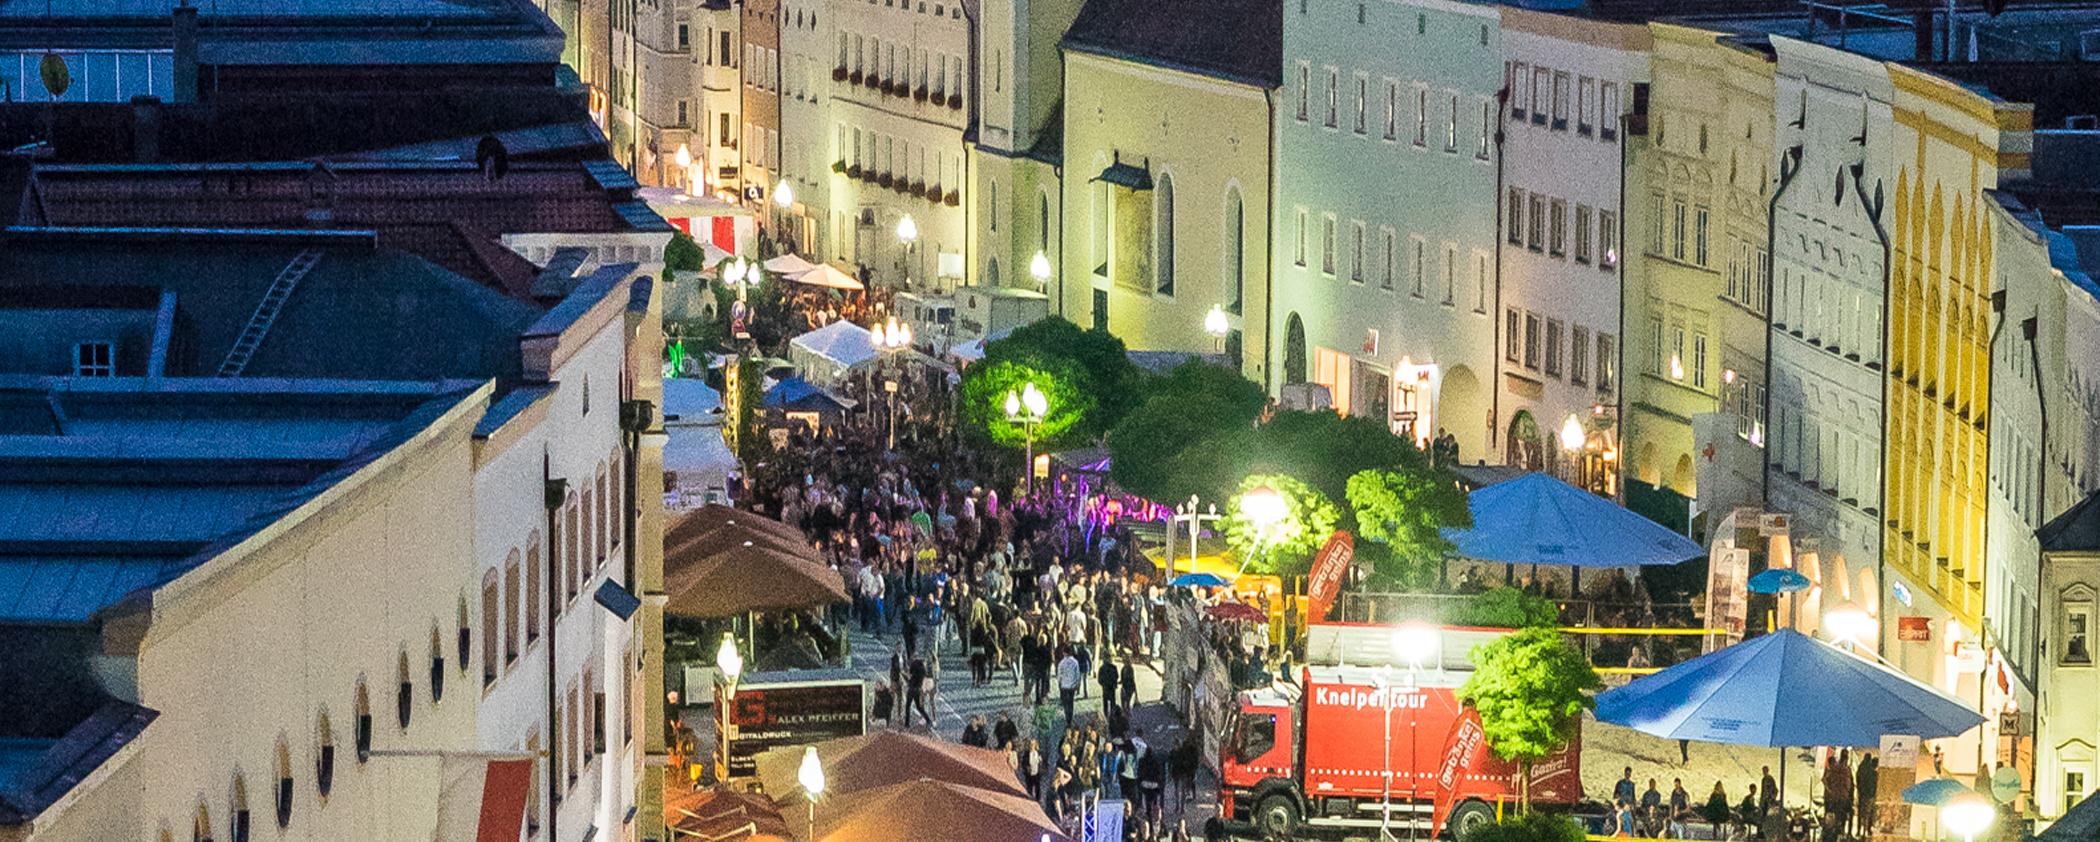 Das Mühldorfer Altstadtfest